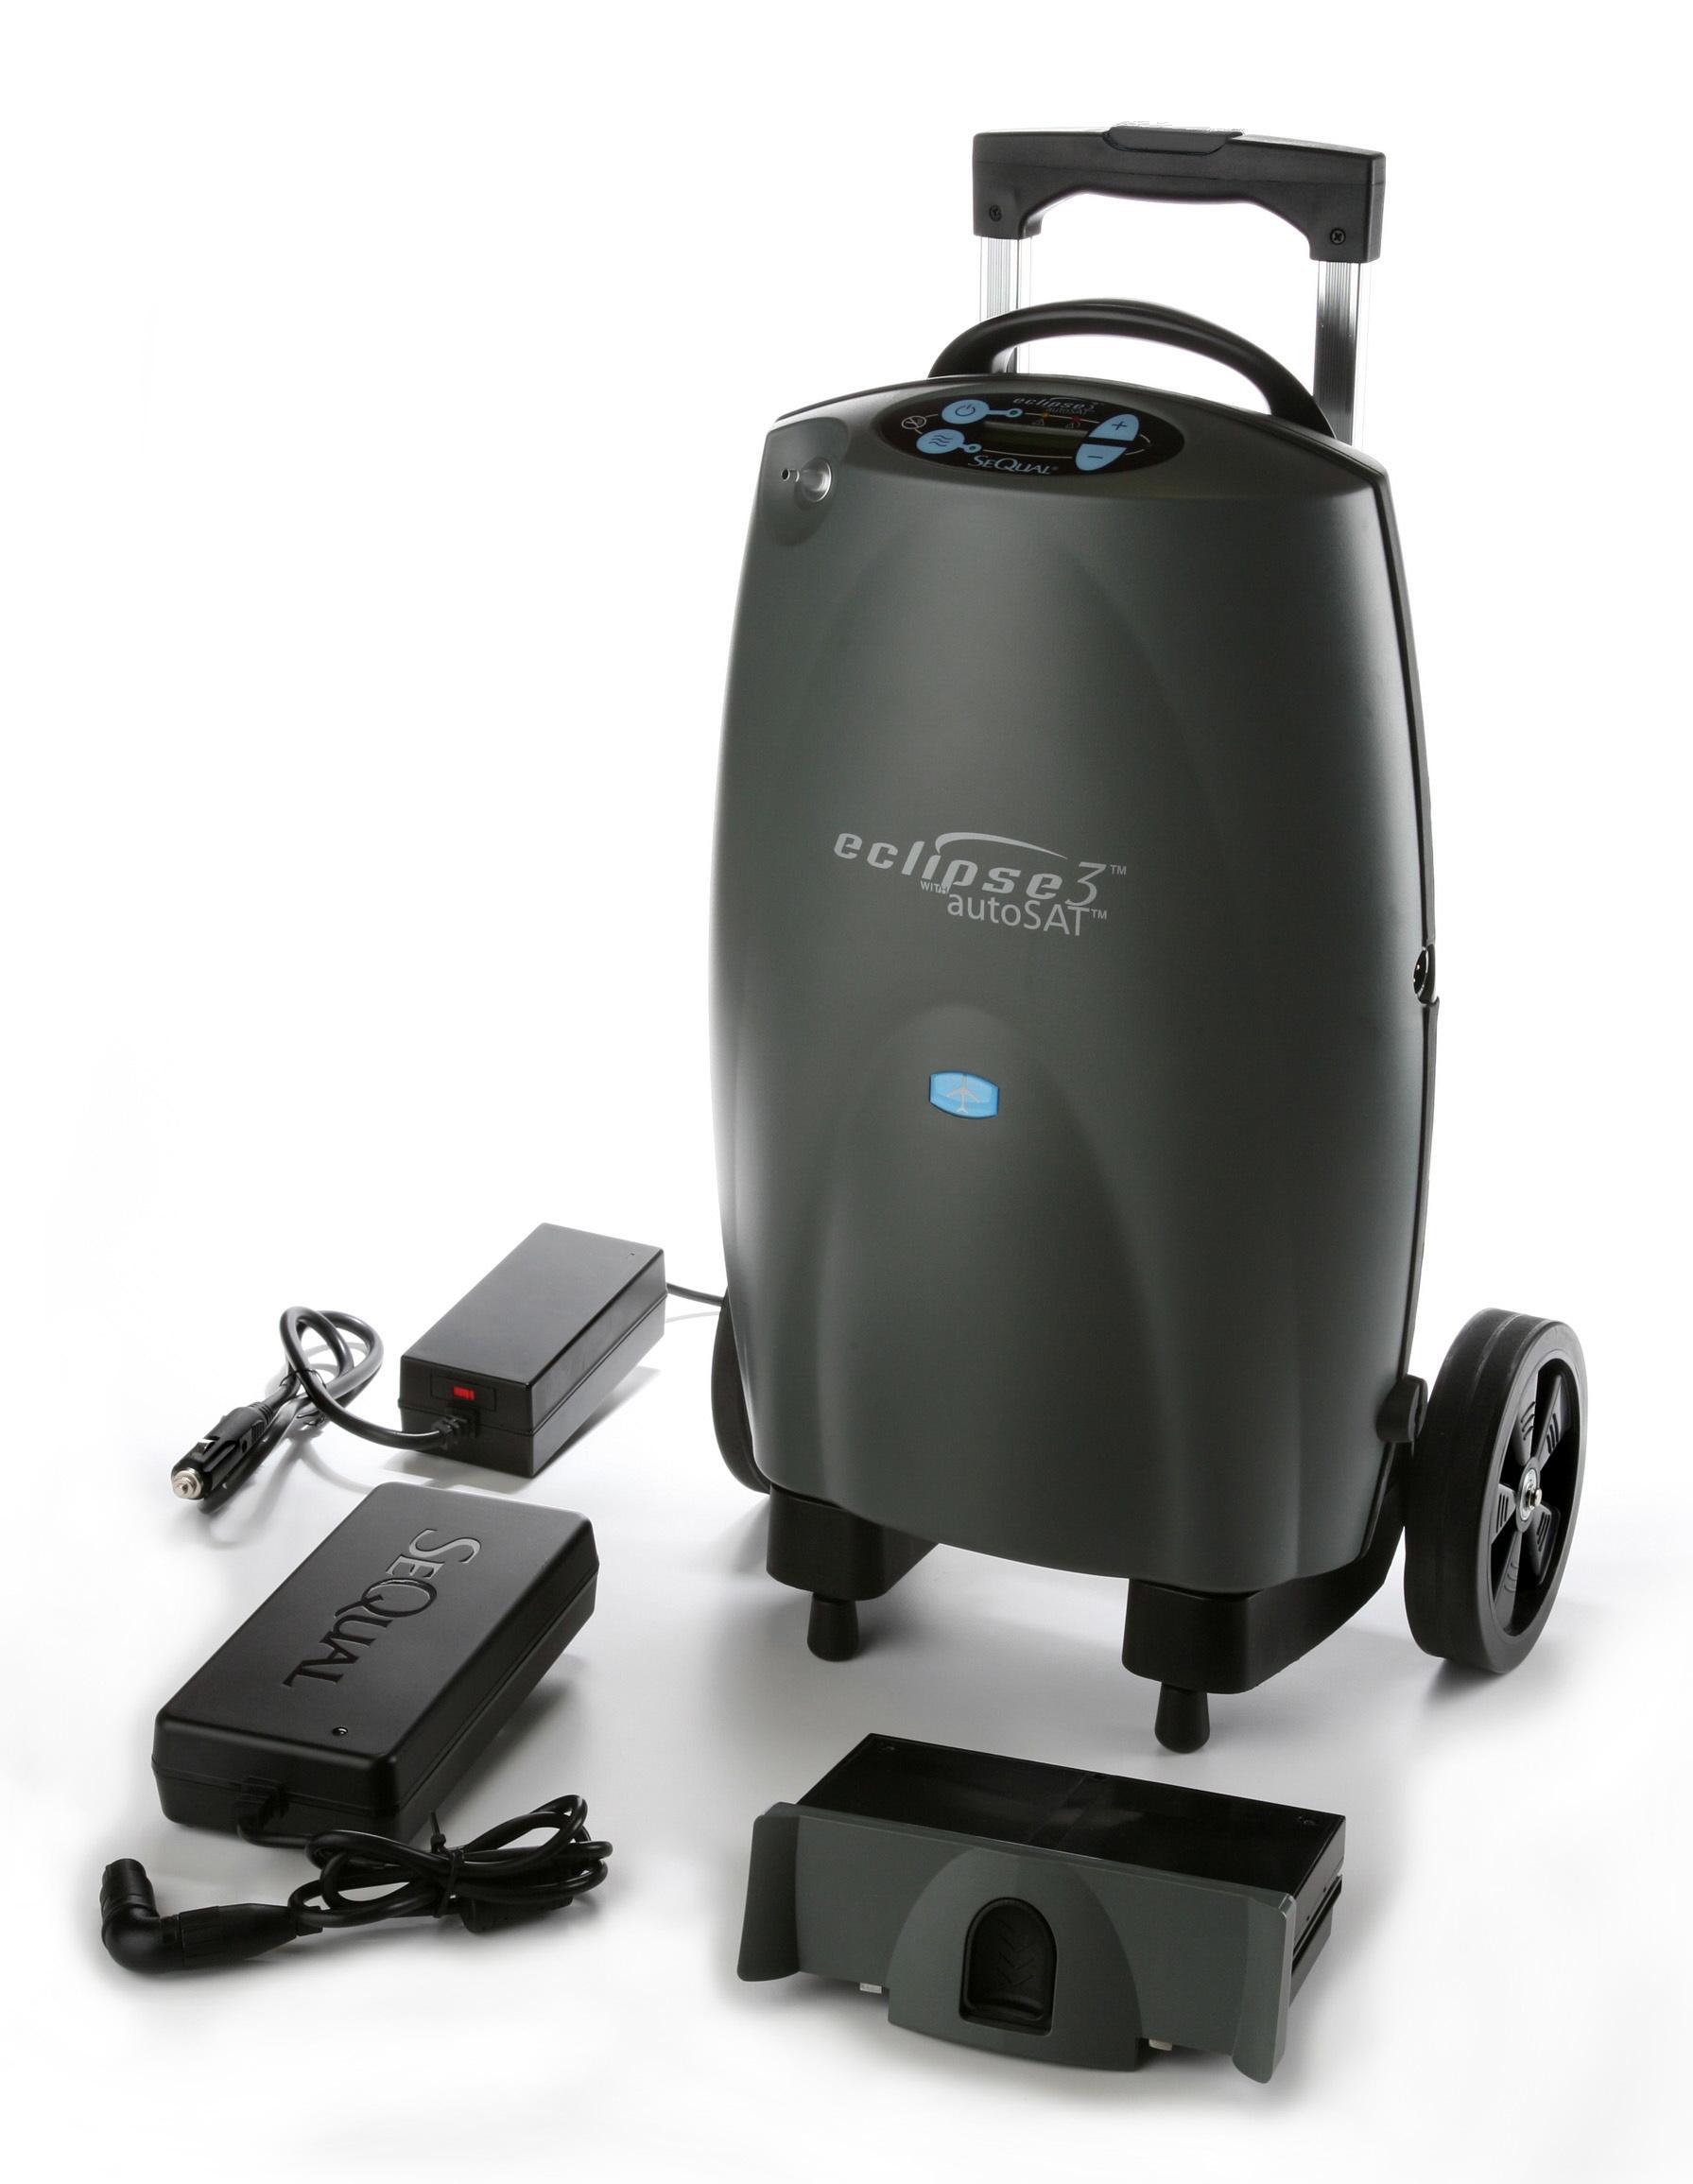 Eclipse 3 Portable Oxygen Concentrator